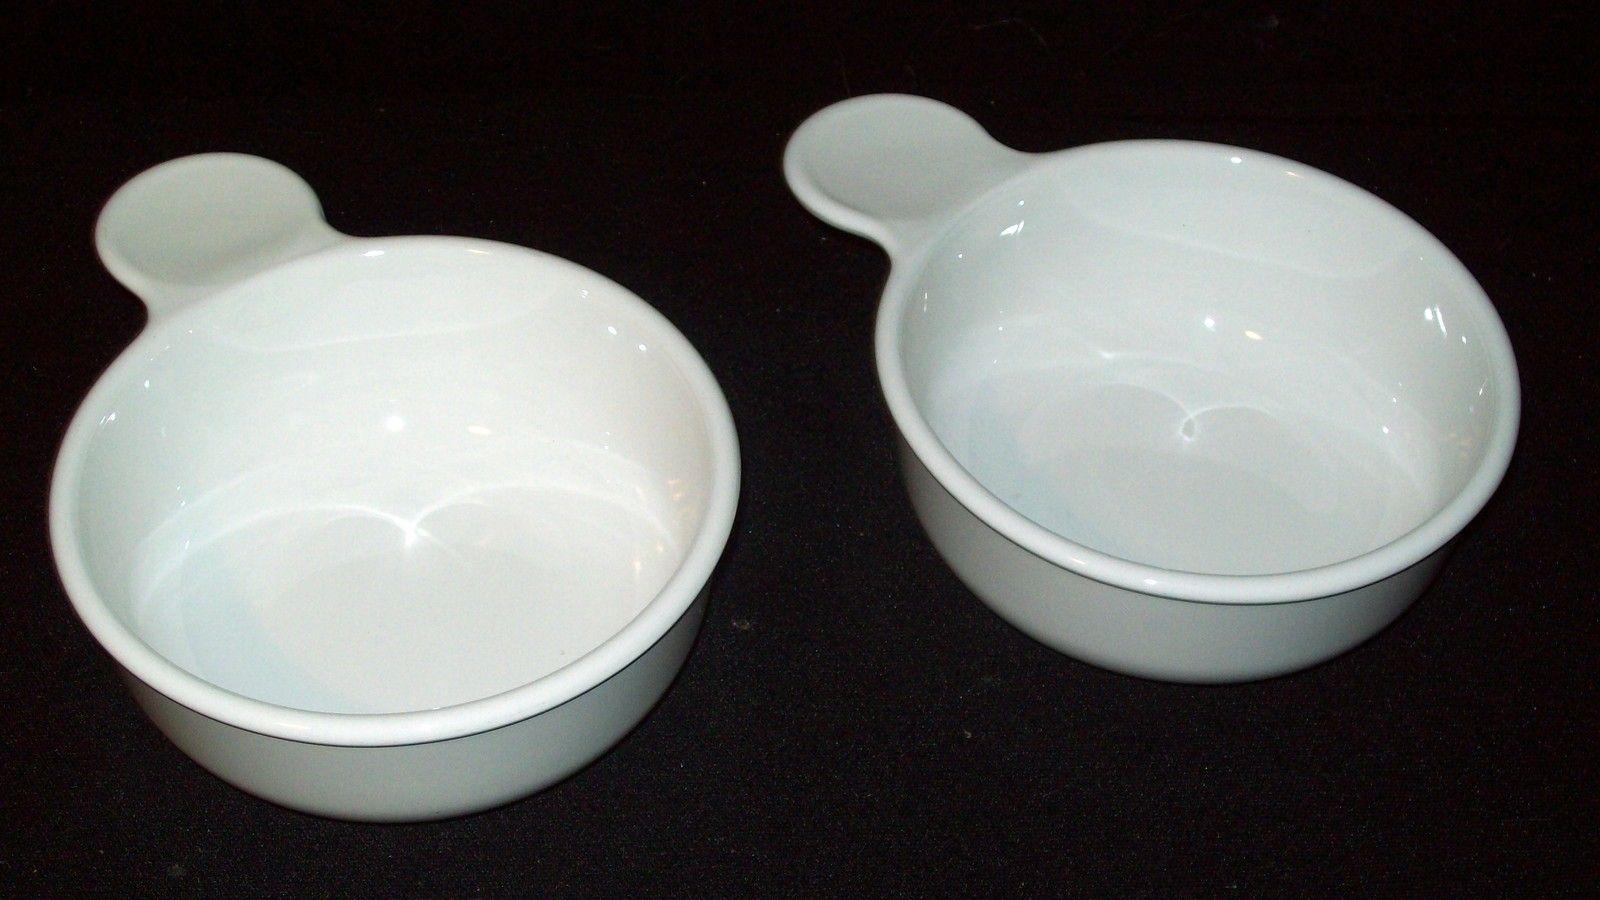 Set of (2) Corningware Grab It Bowls - White - Great Condition - No Lids